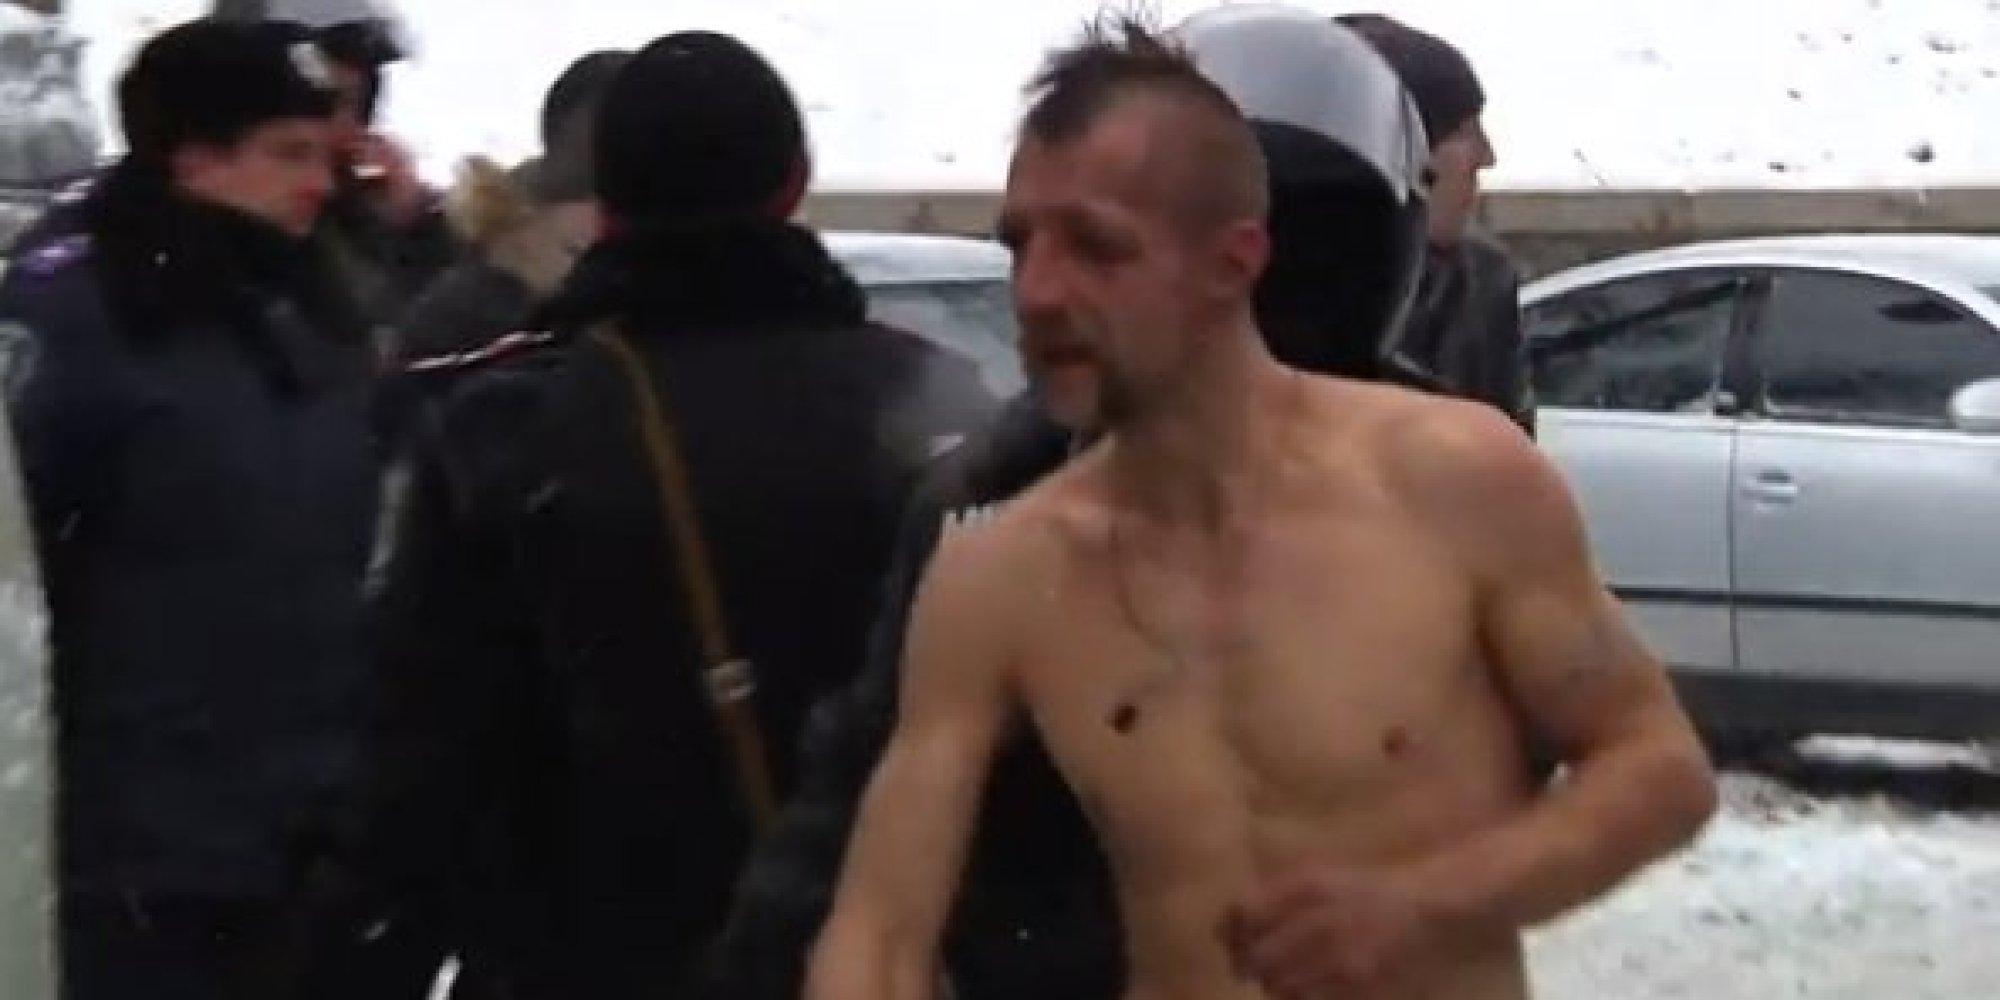 ukraina boys nudist ukrainian boys nude